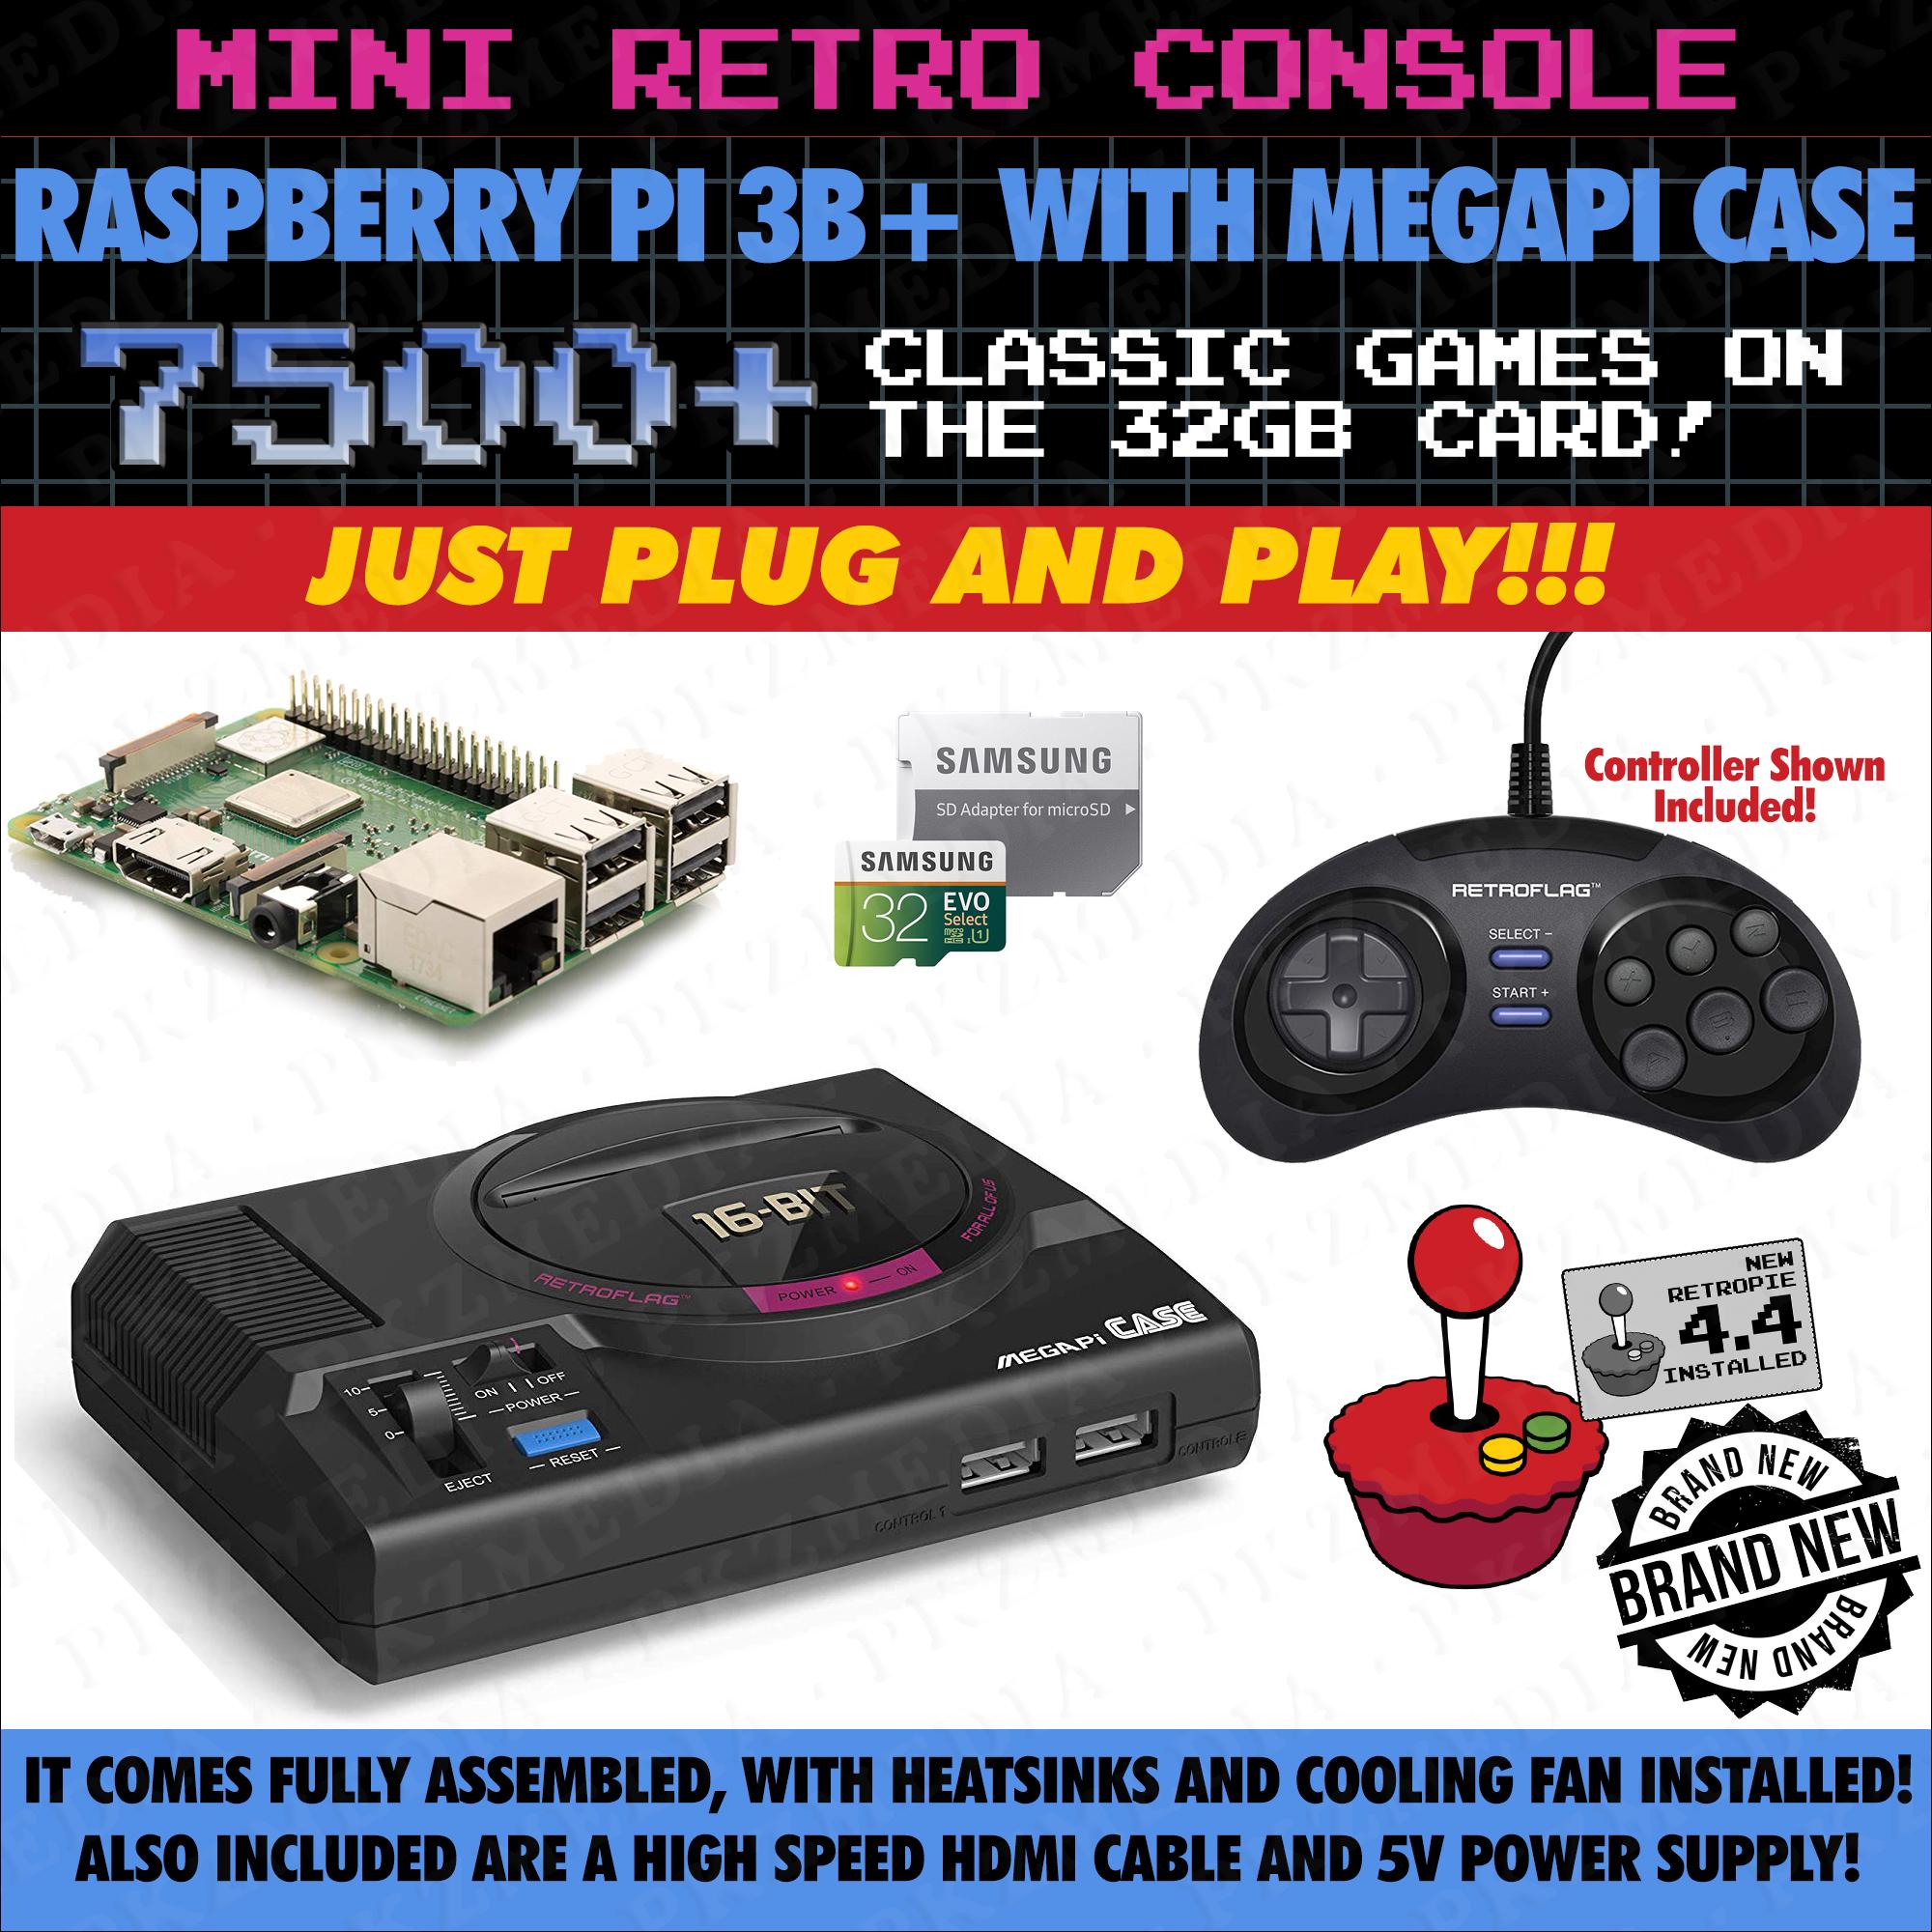 Mega Drive / Genesis Style Retropie Gaming Console Raspberry Pi 3B+ W/ 7,500 Games Preloaded